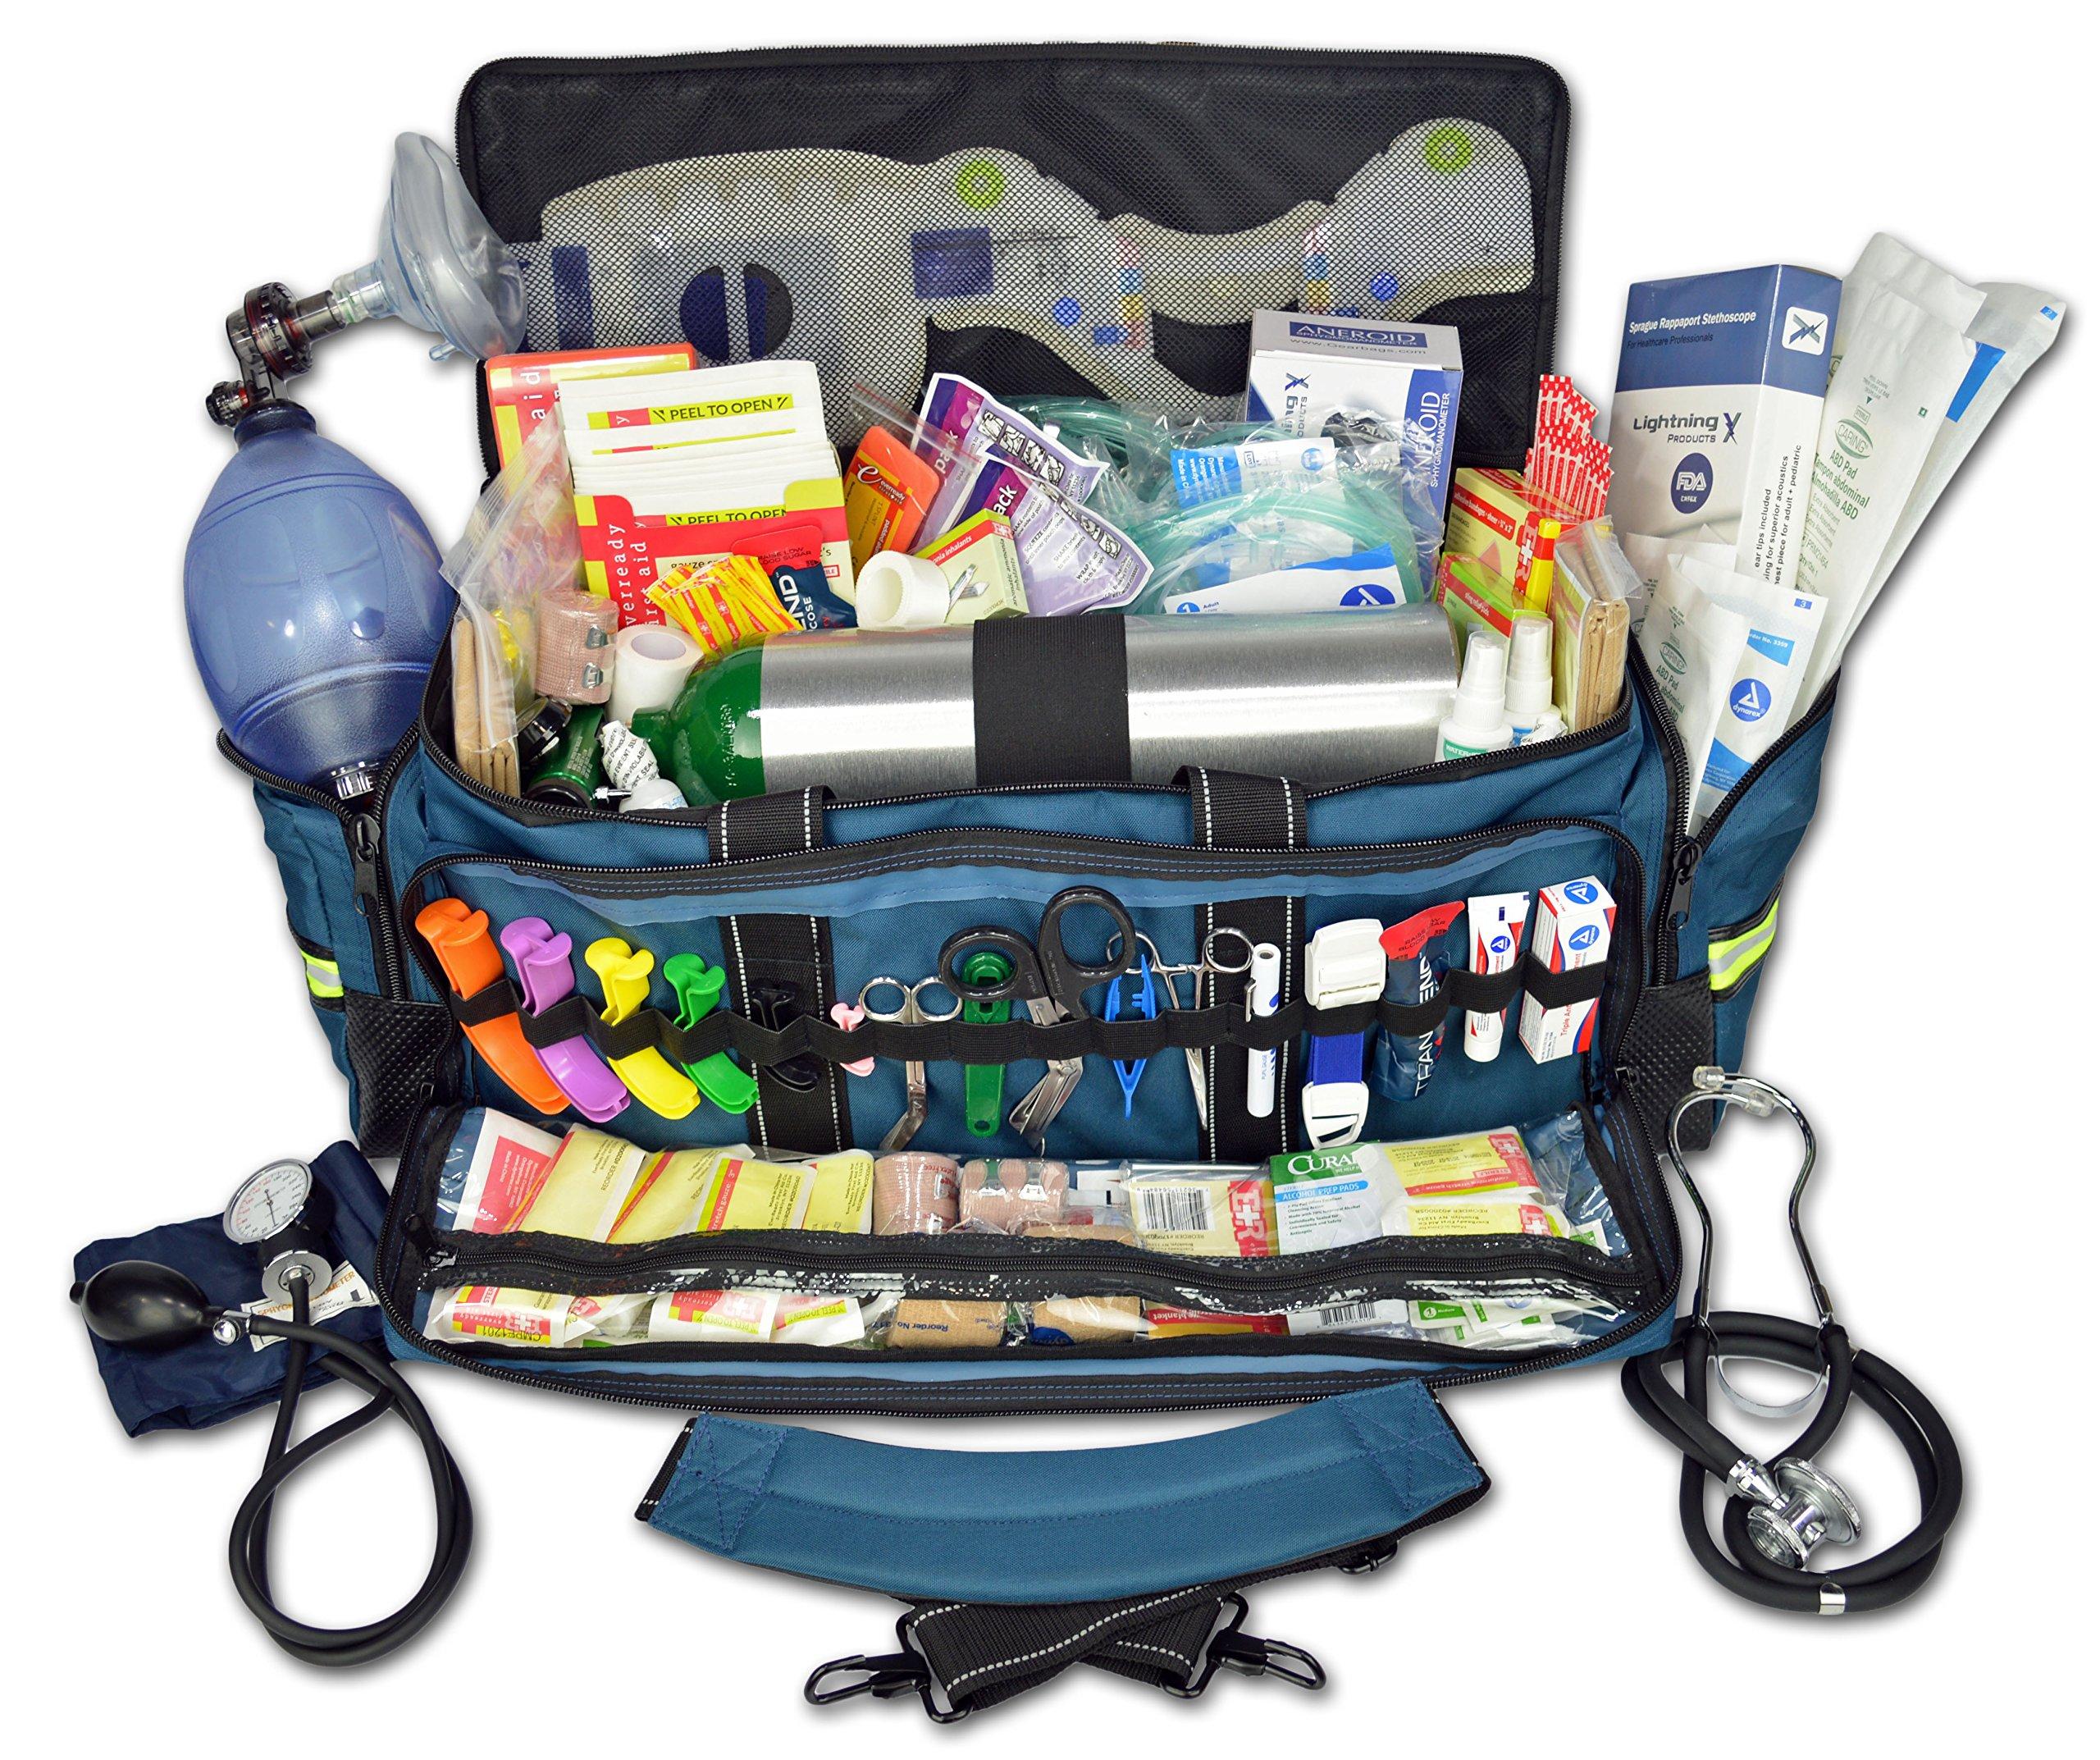 Lightning X Jumbo Oxygen Medic First Responder EMT/EMS Bag Stocked Trauma Kit LXMB50-SKD (Blue) by Lightning X Products